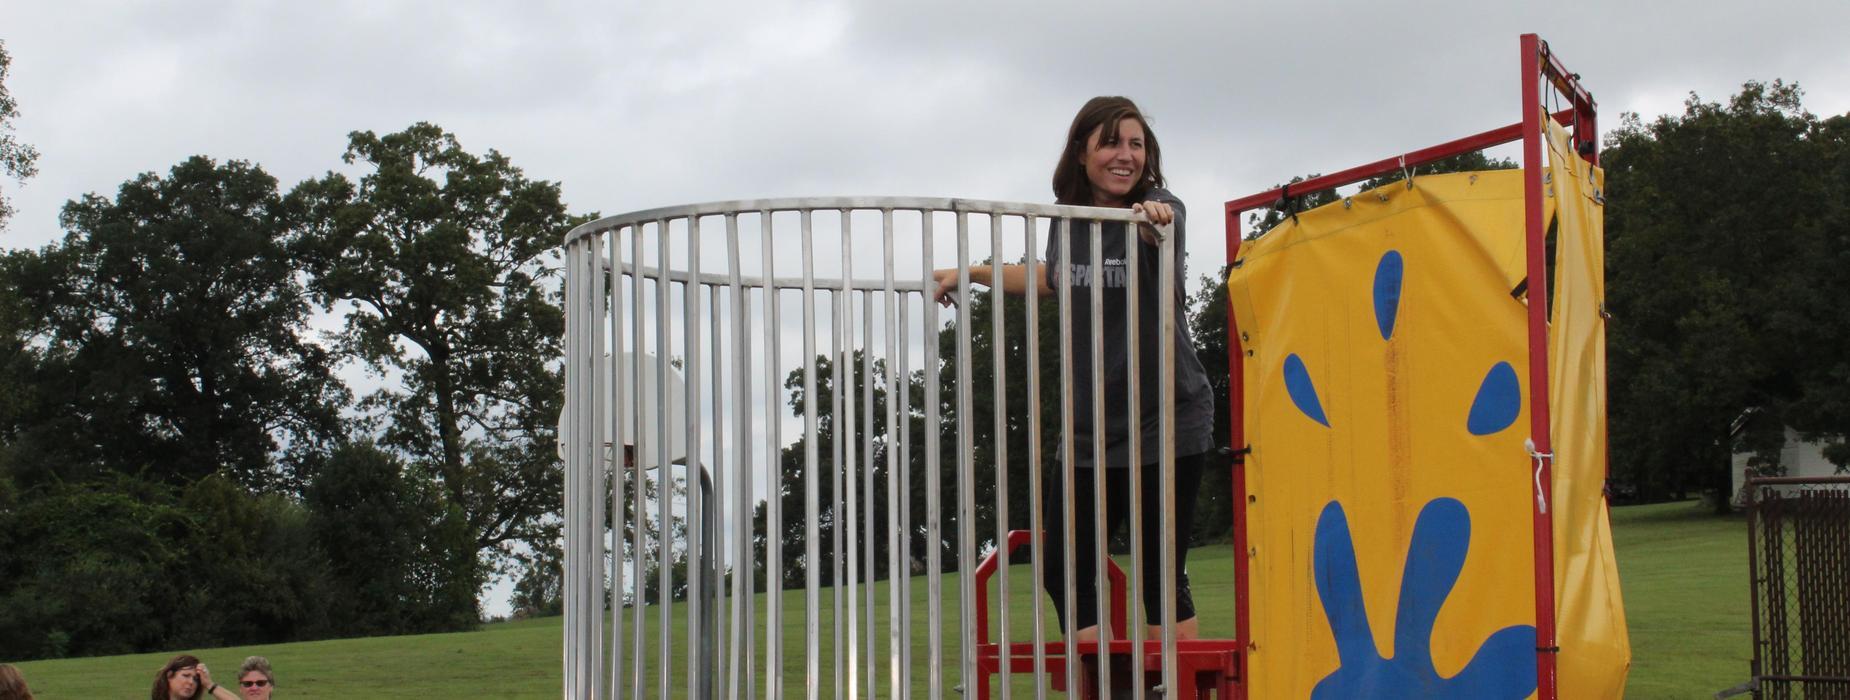 dunking booth principal